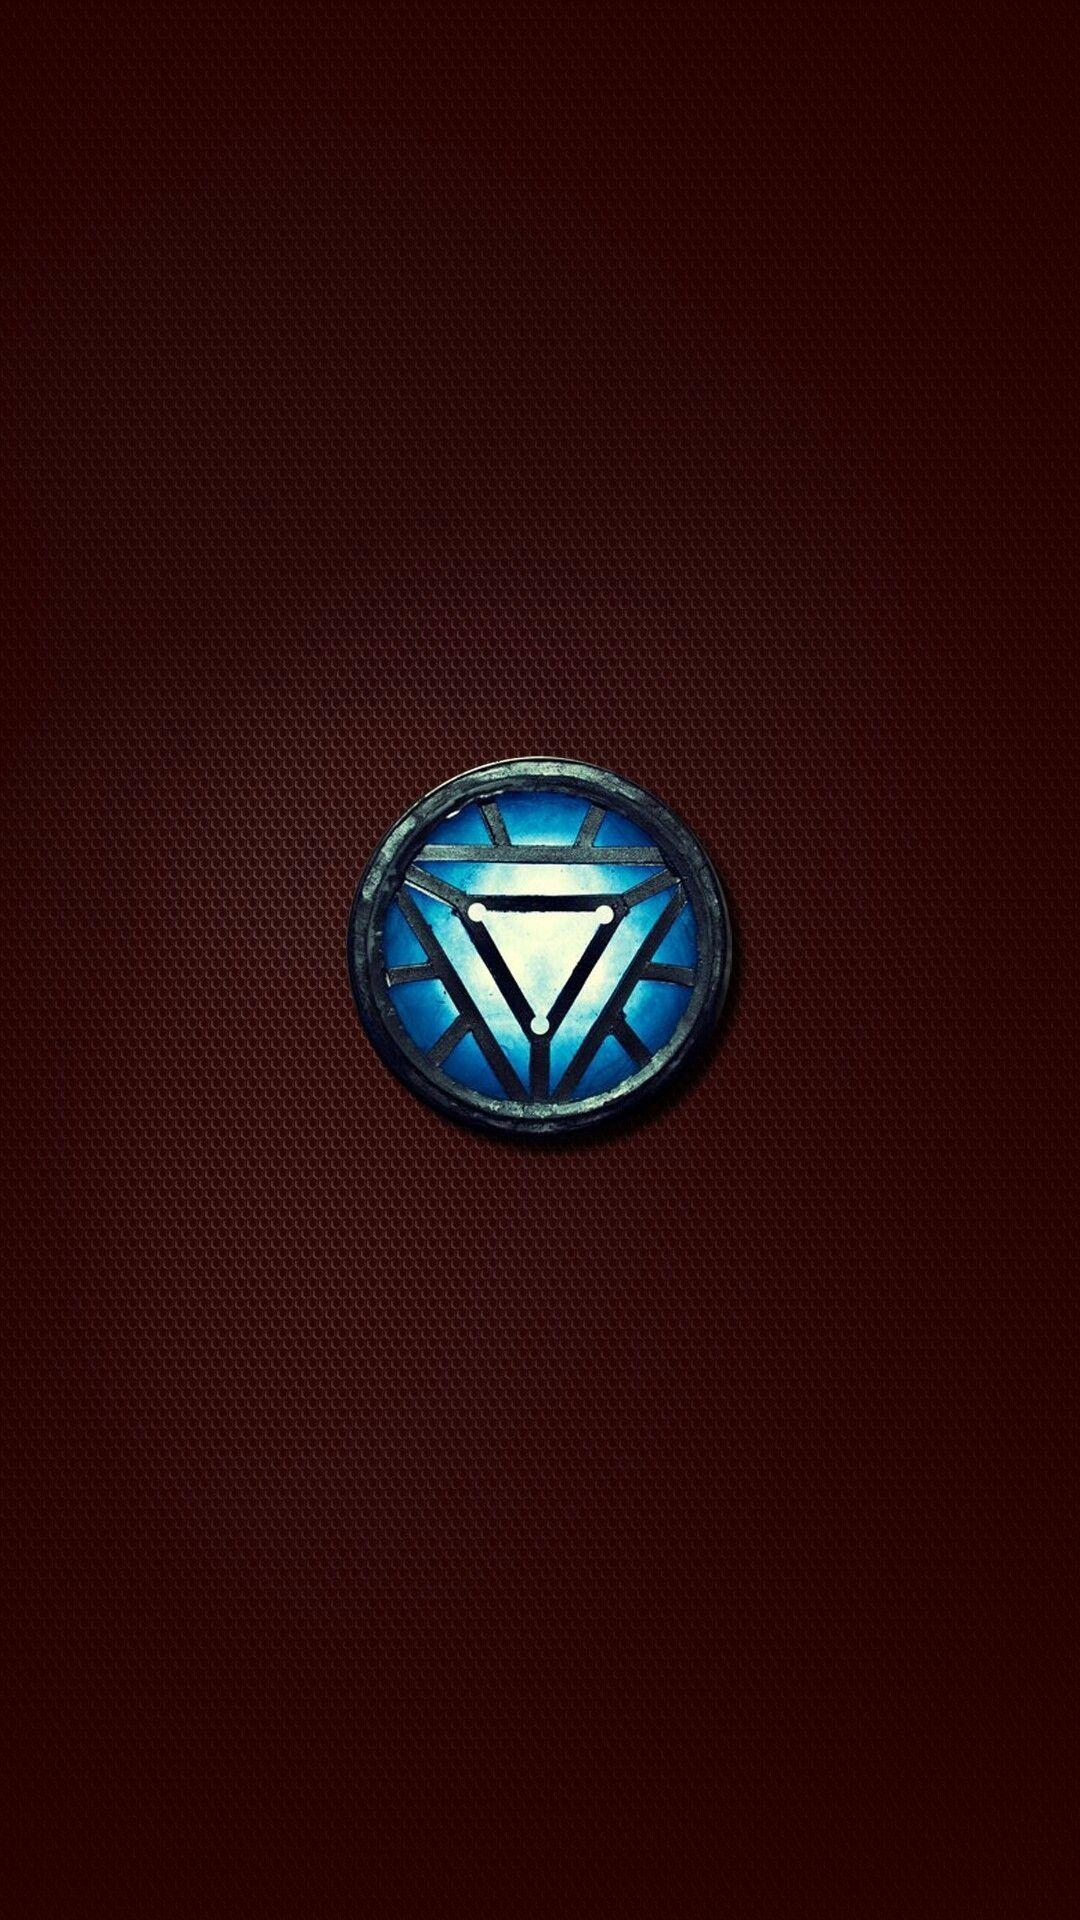 Pin By Jatin Shah On Jrs Marvel Comics Wallpaper Iron Man